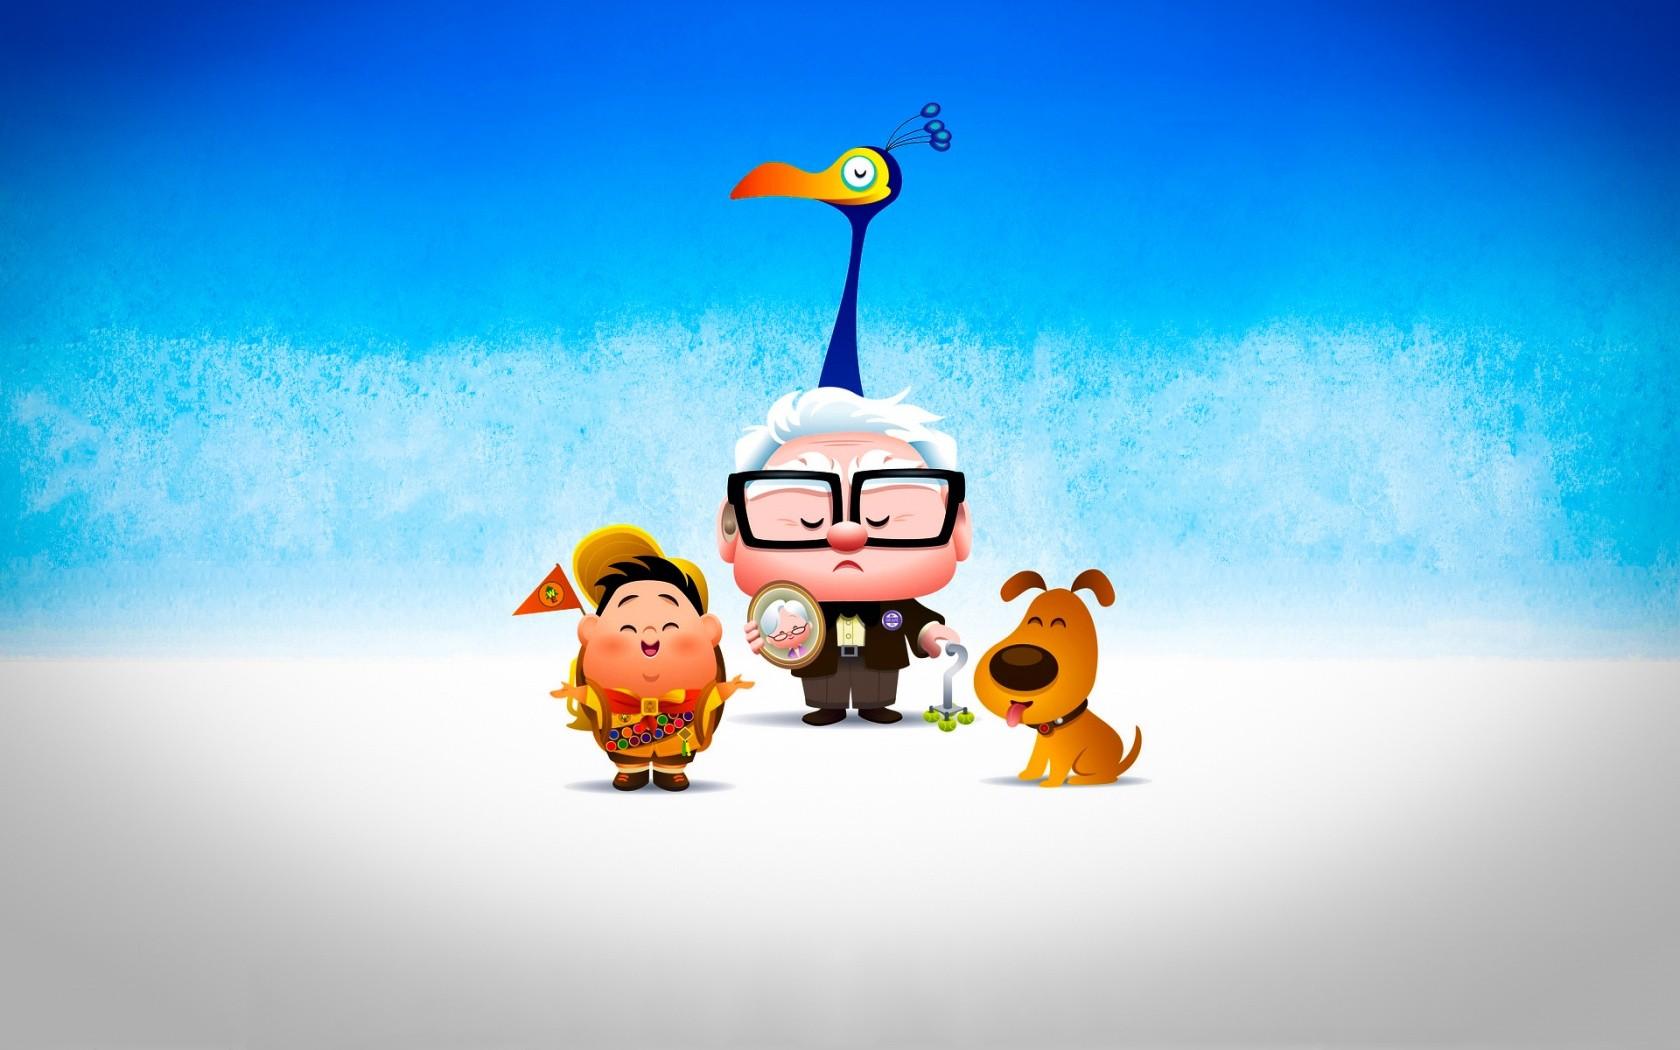 Good Wallpaper Movie Animated - illustration-movies-logo-cartoon-Toy-animated-movies-Up-movie-Pixar-Animation-Studios-screenshot-computer-wallpaper-248023  Pictures_15814.jpg